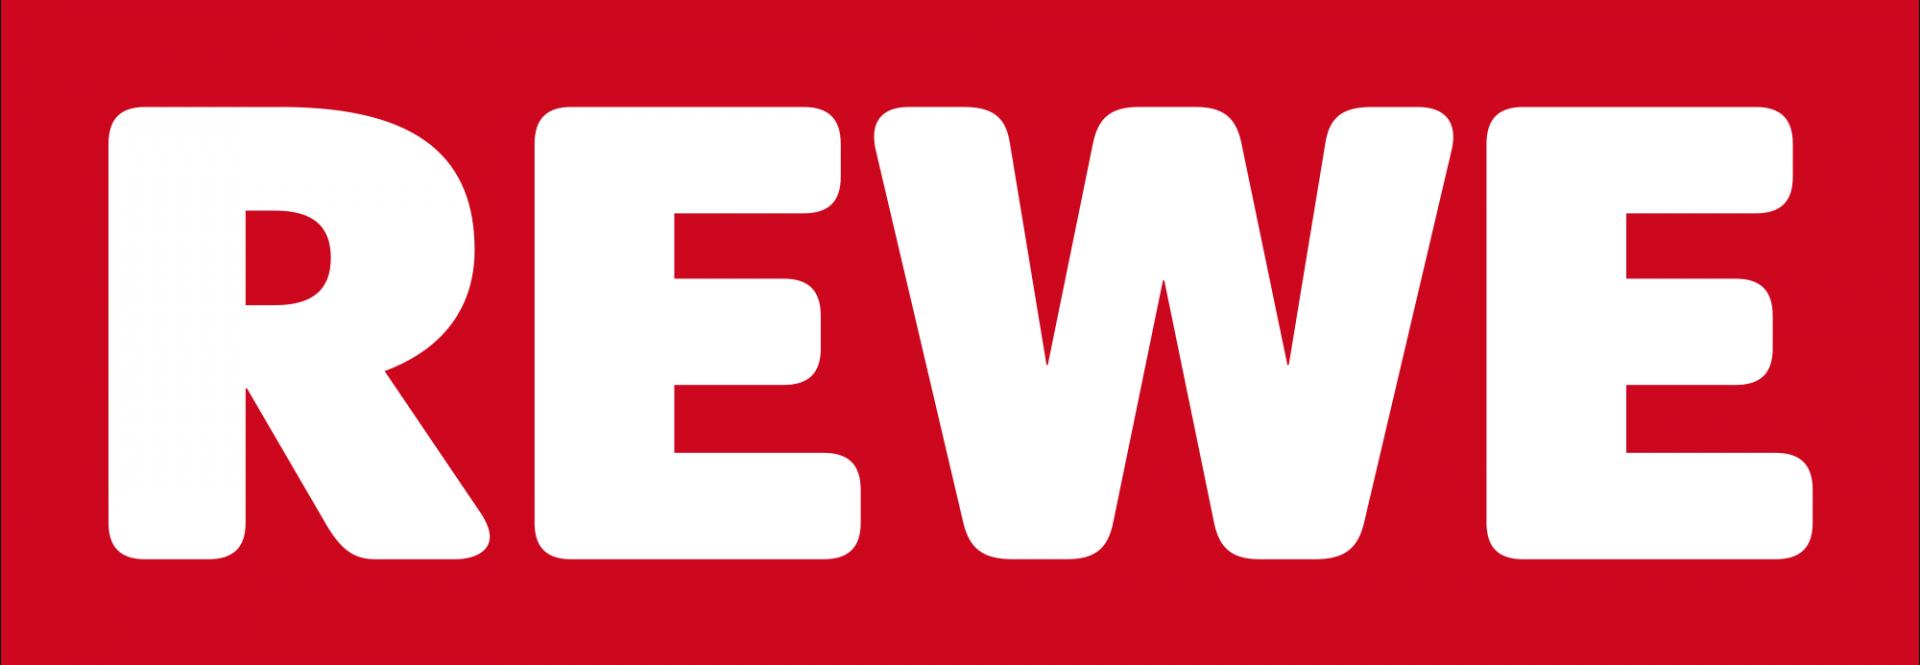 2000px-logo_rewe-svg